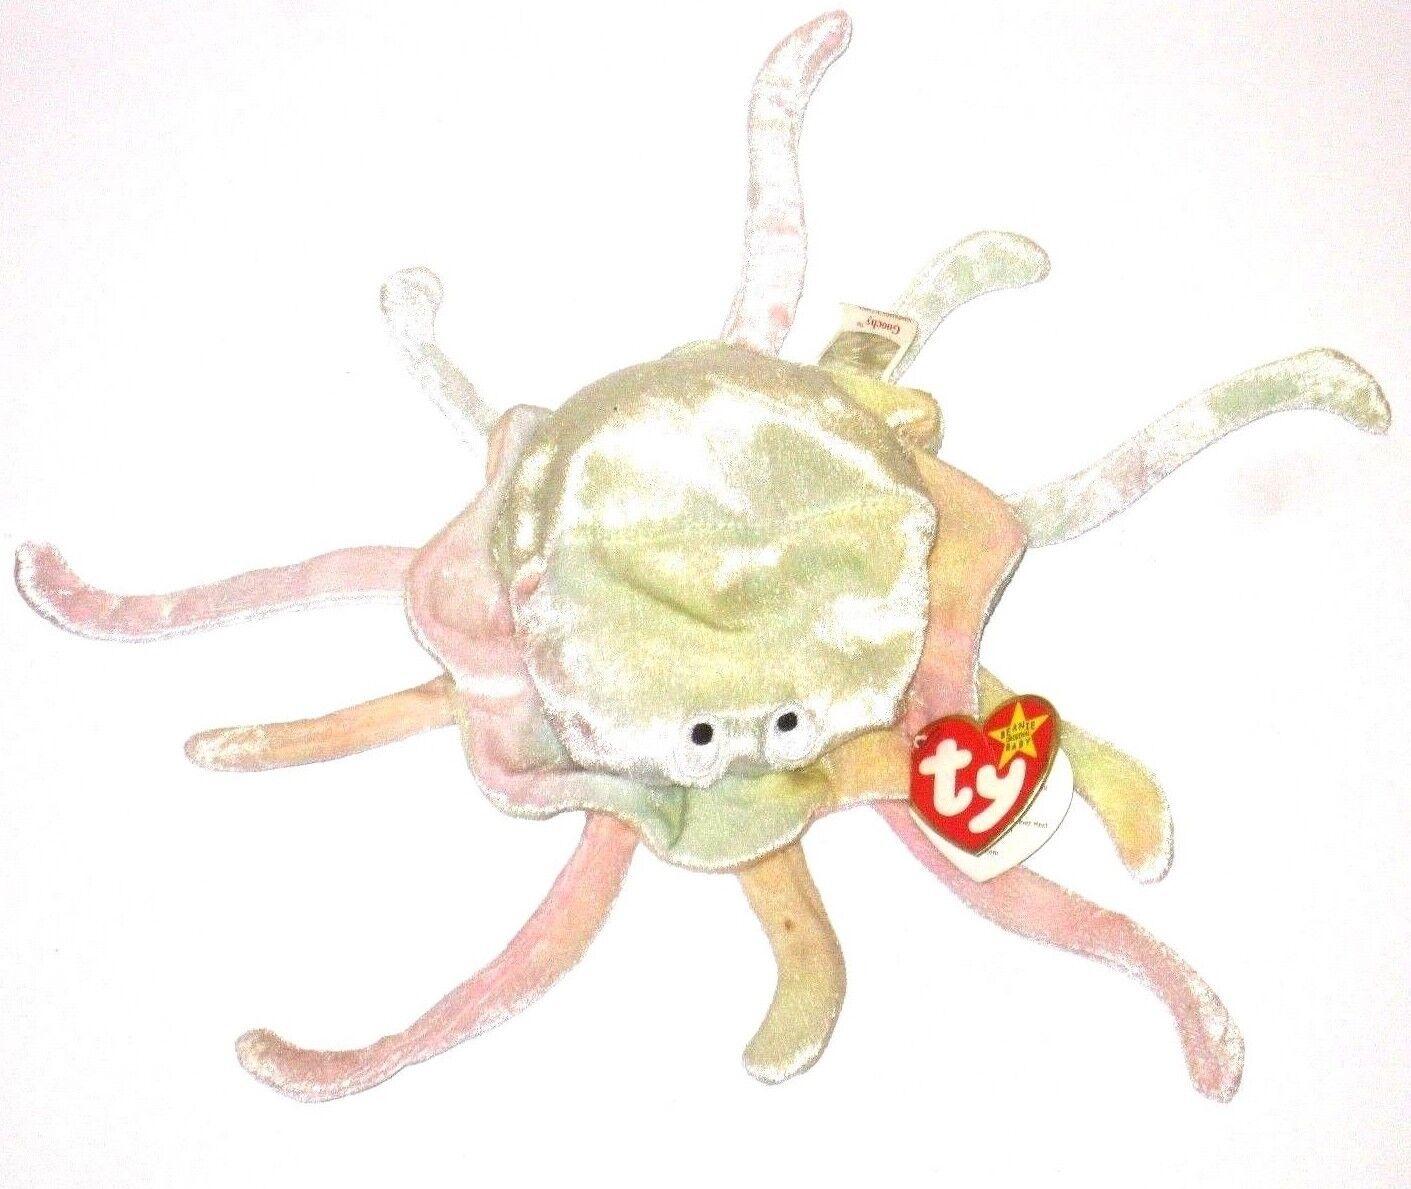 Ty Beanie Babies Original Goochy P E Pellets 1998 1999 Retired Jellyfish Errors